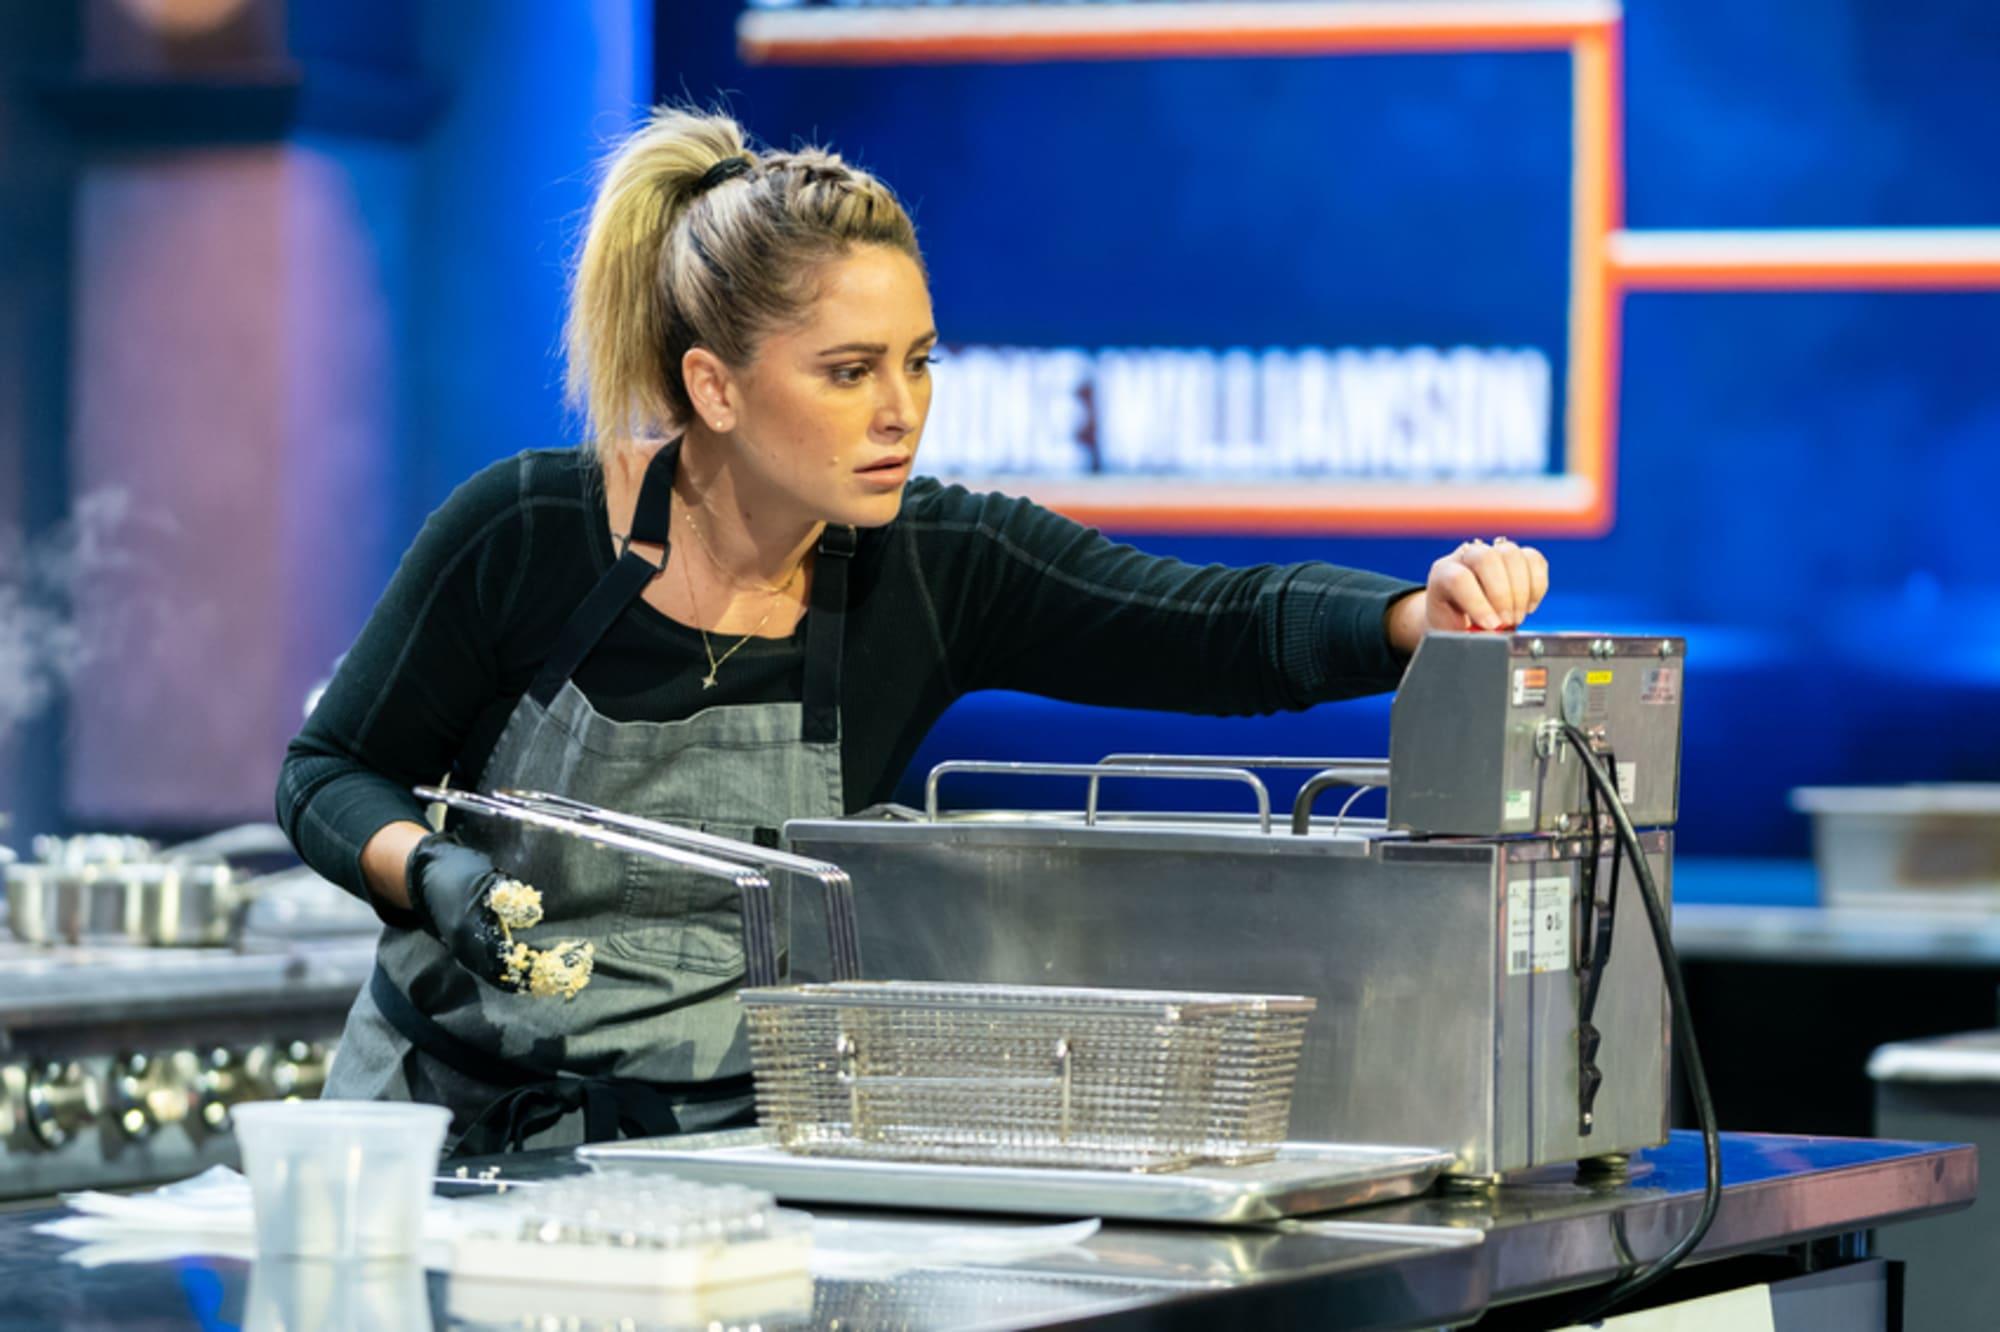 Tournament of Champions Season 2 winner: Women rule the kitchen